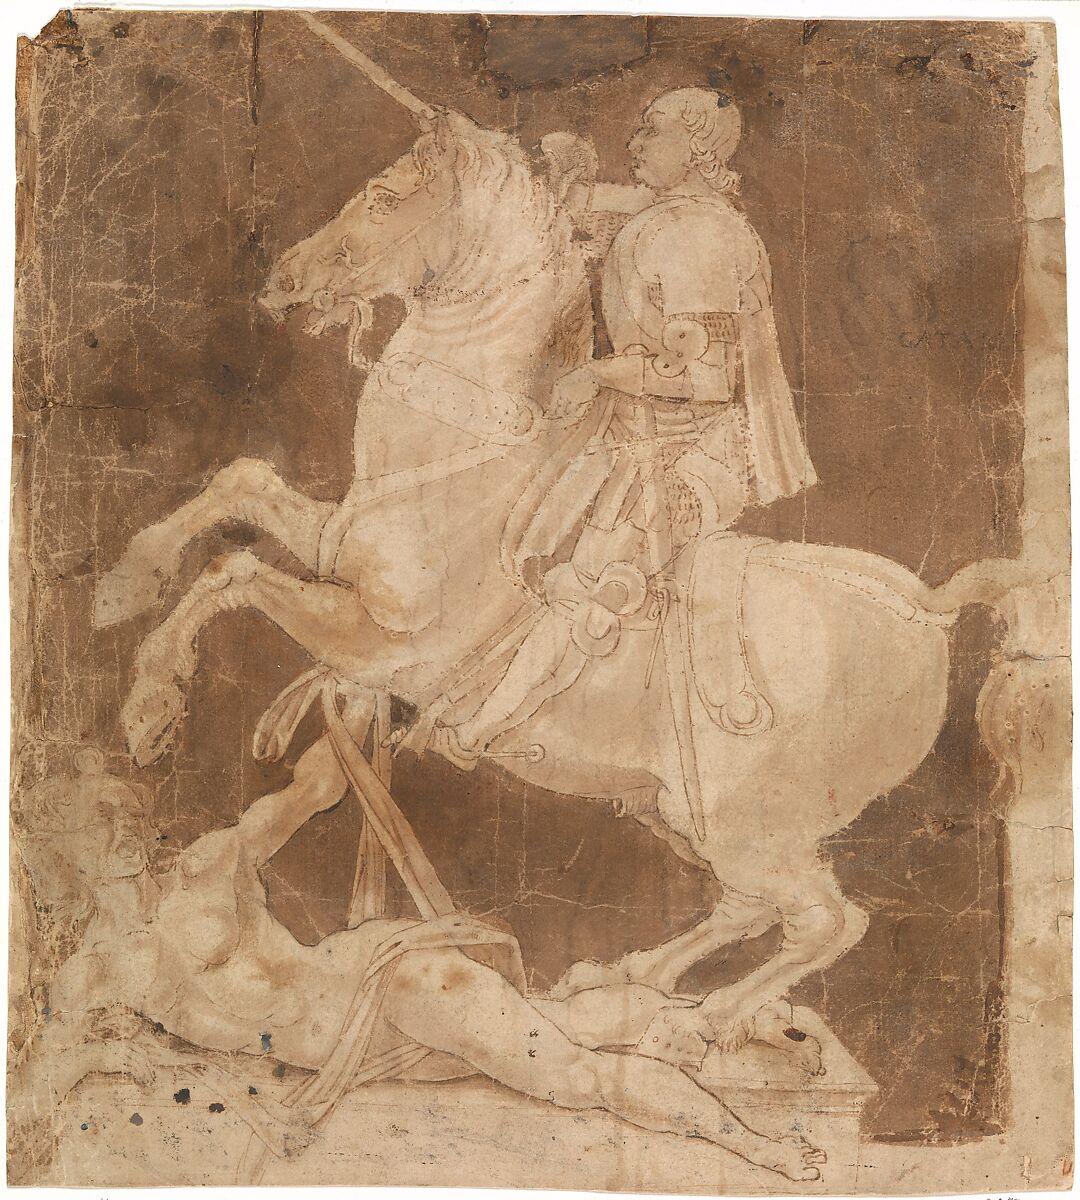 Francesco I Sforza